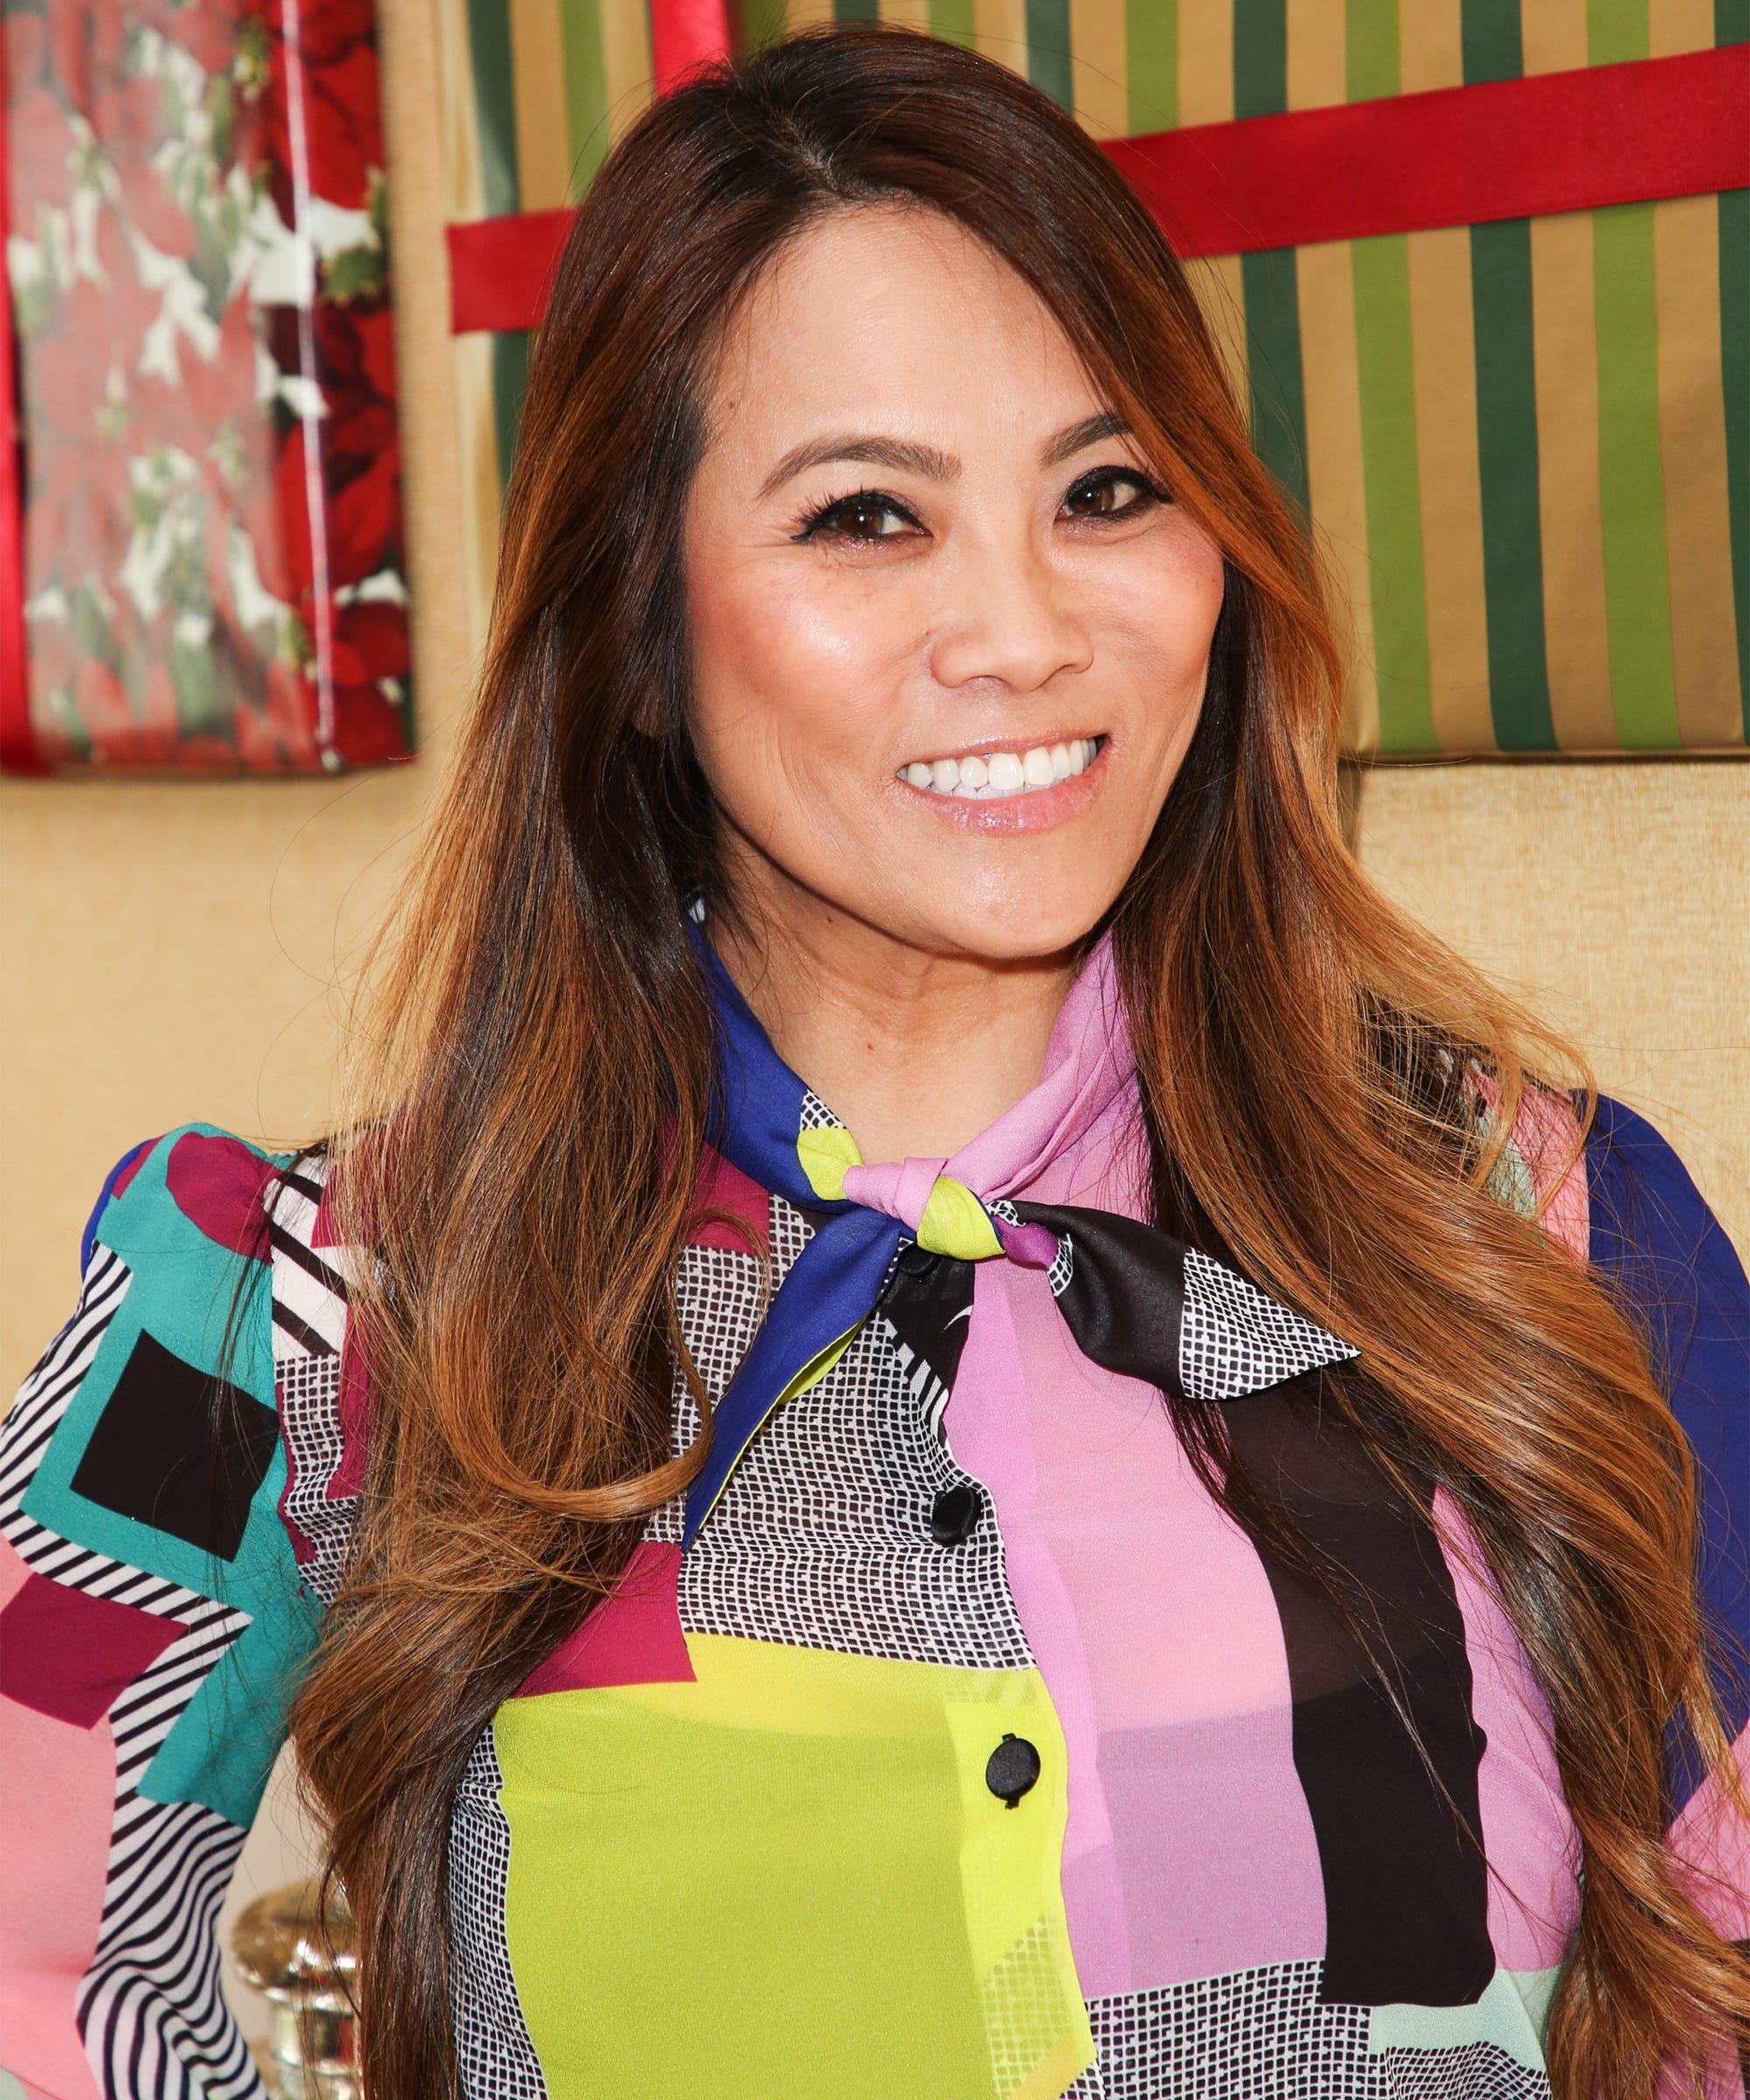 Dr Pimple Popper TLC Show Episode Four Full Review